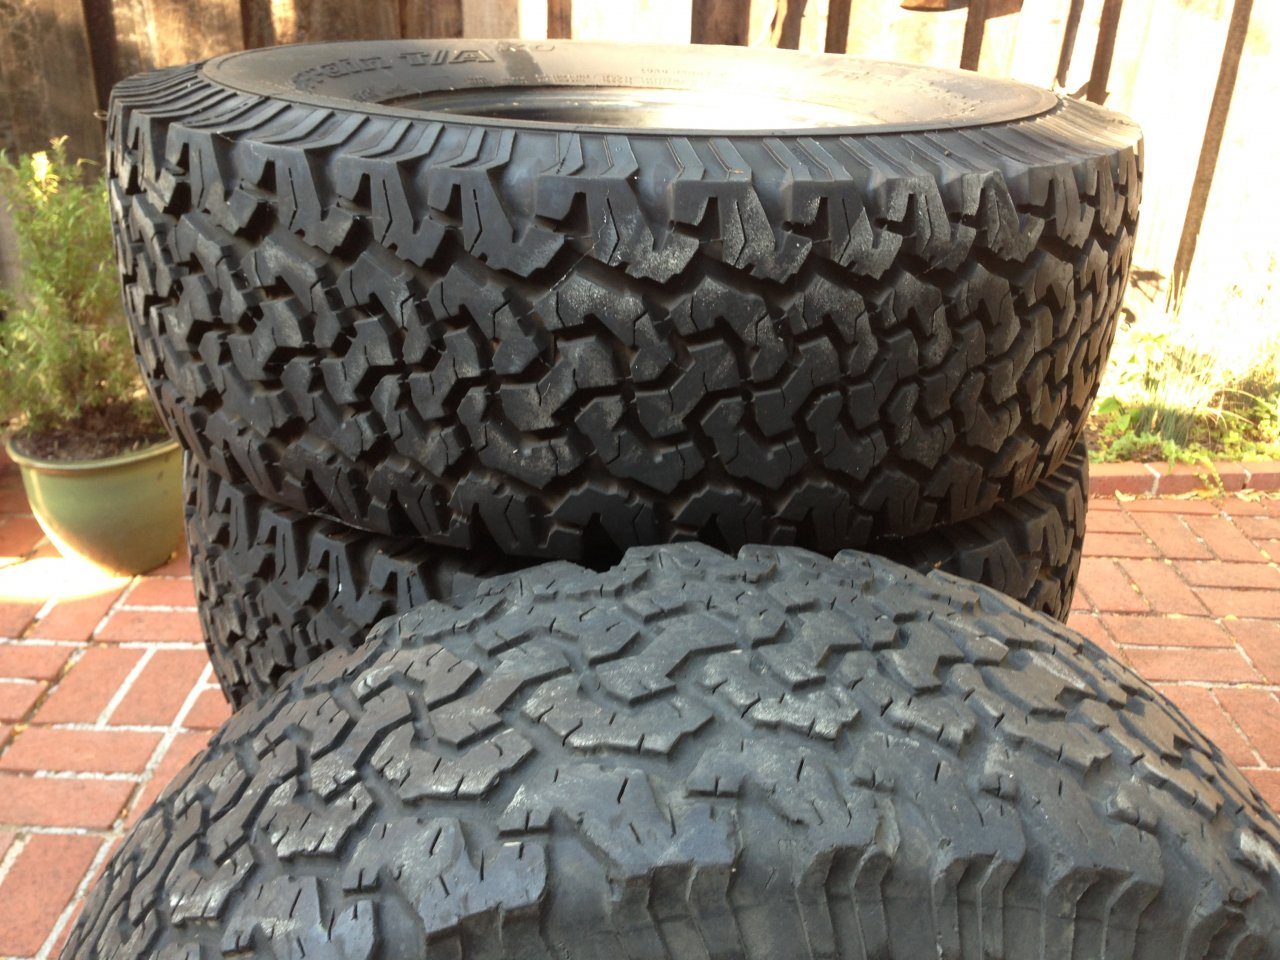 Tires 3.jpg